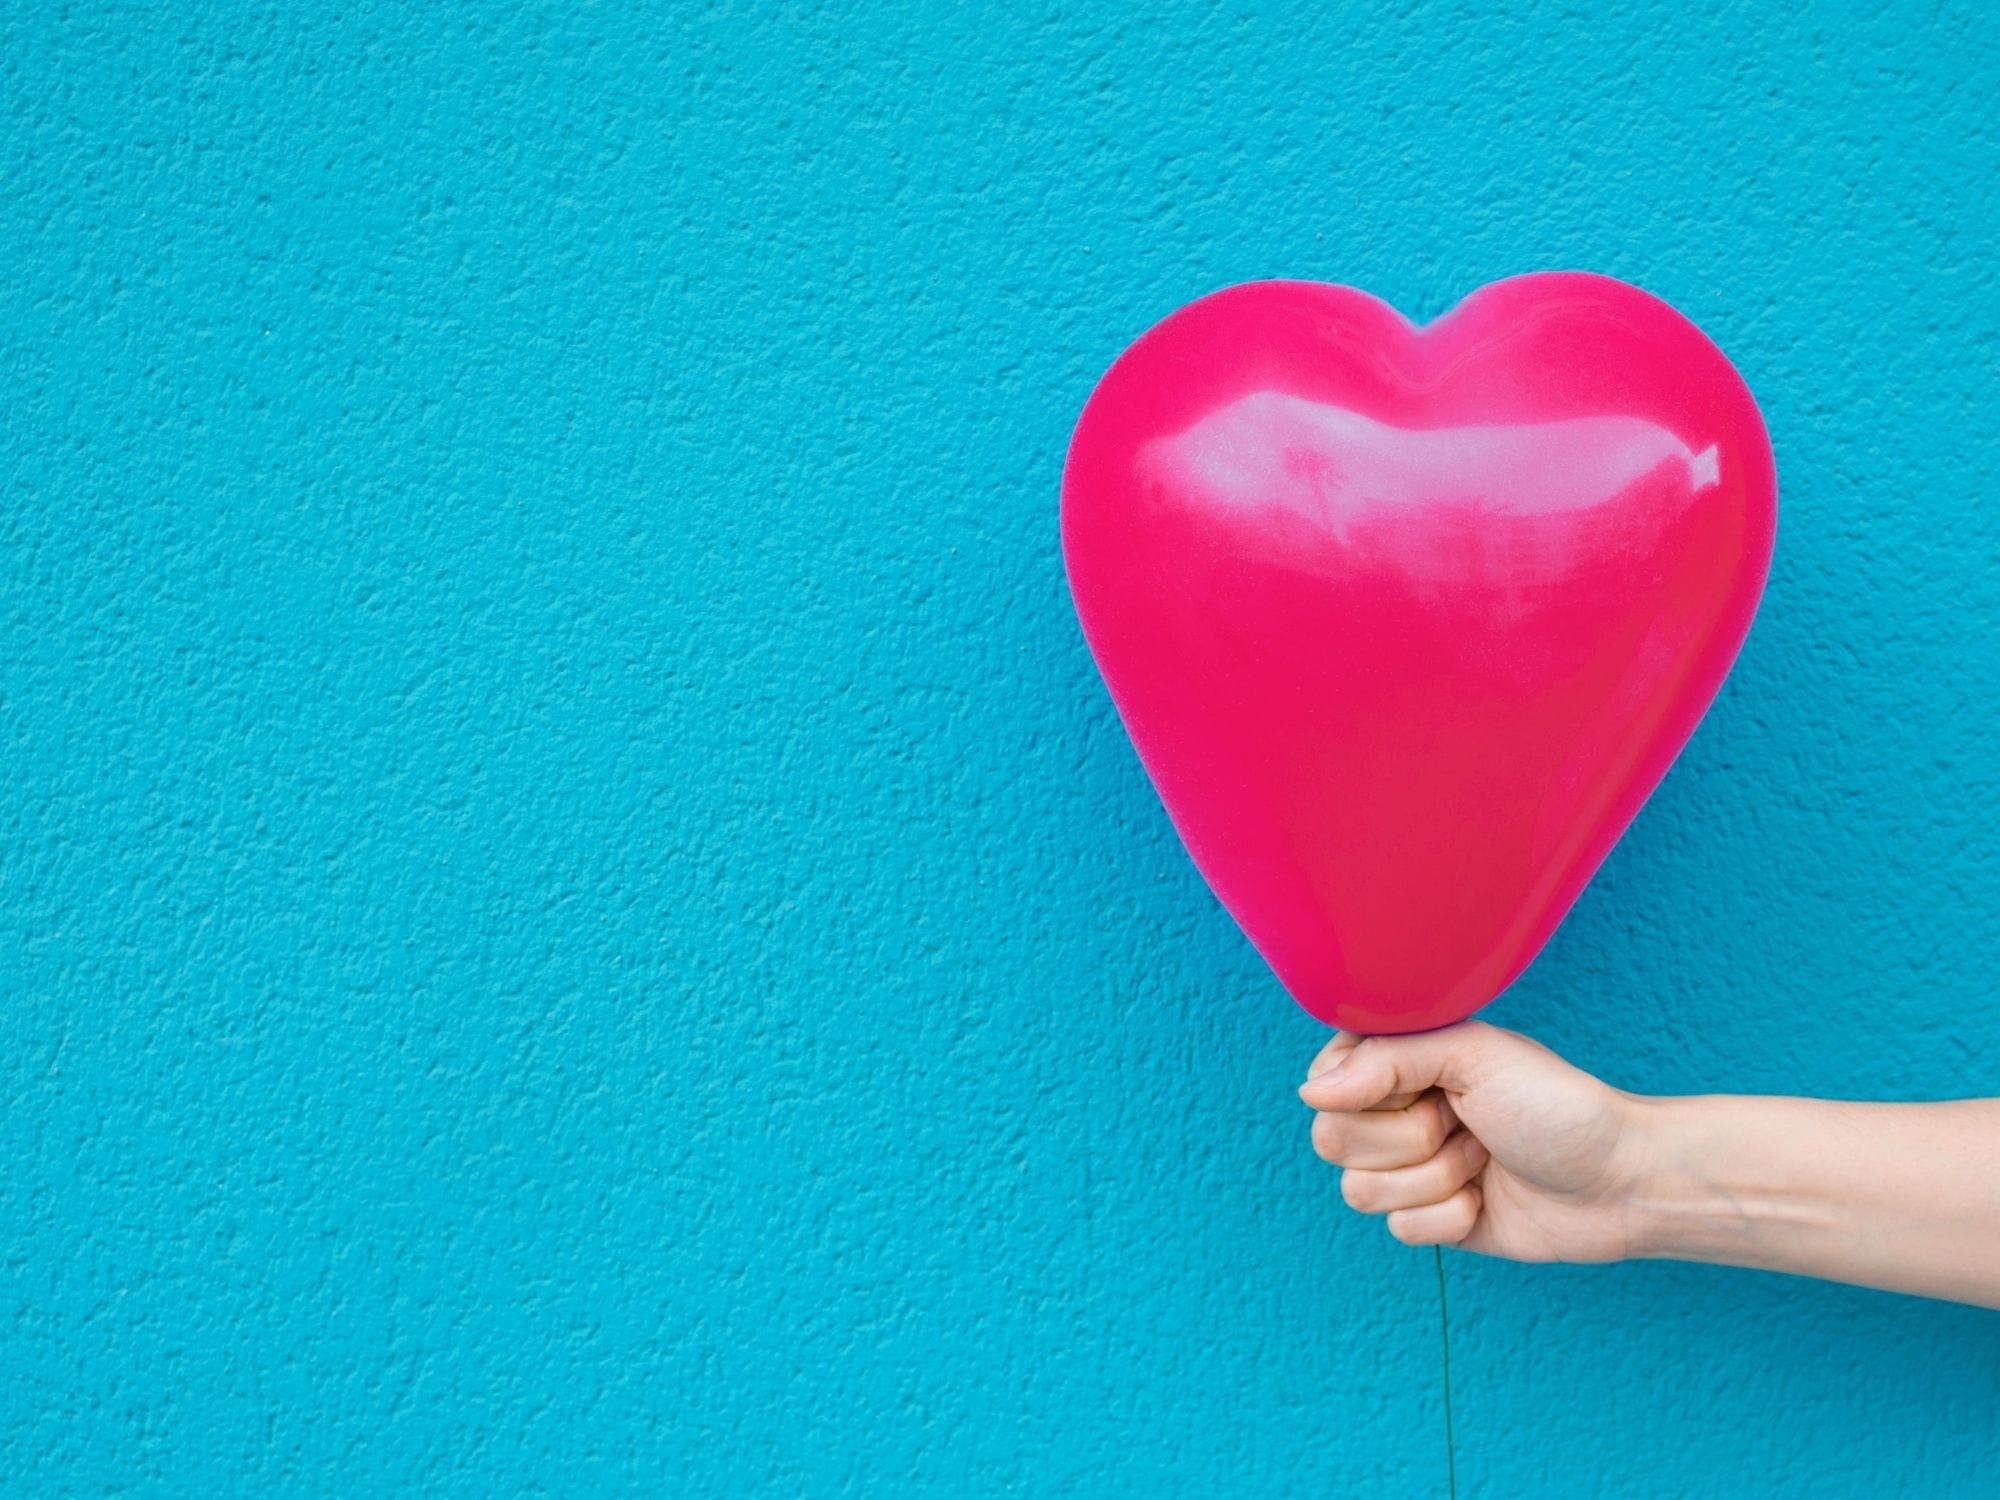 Choosing a business charity